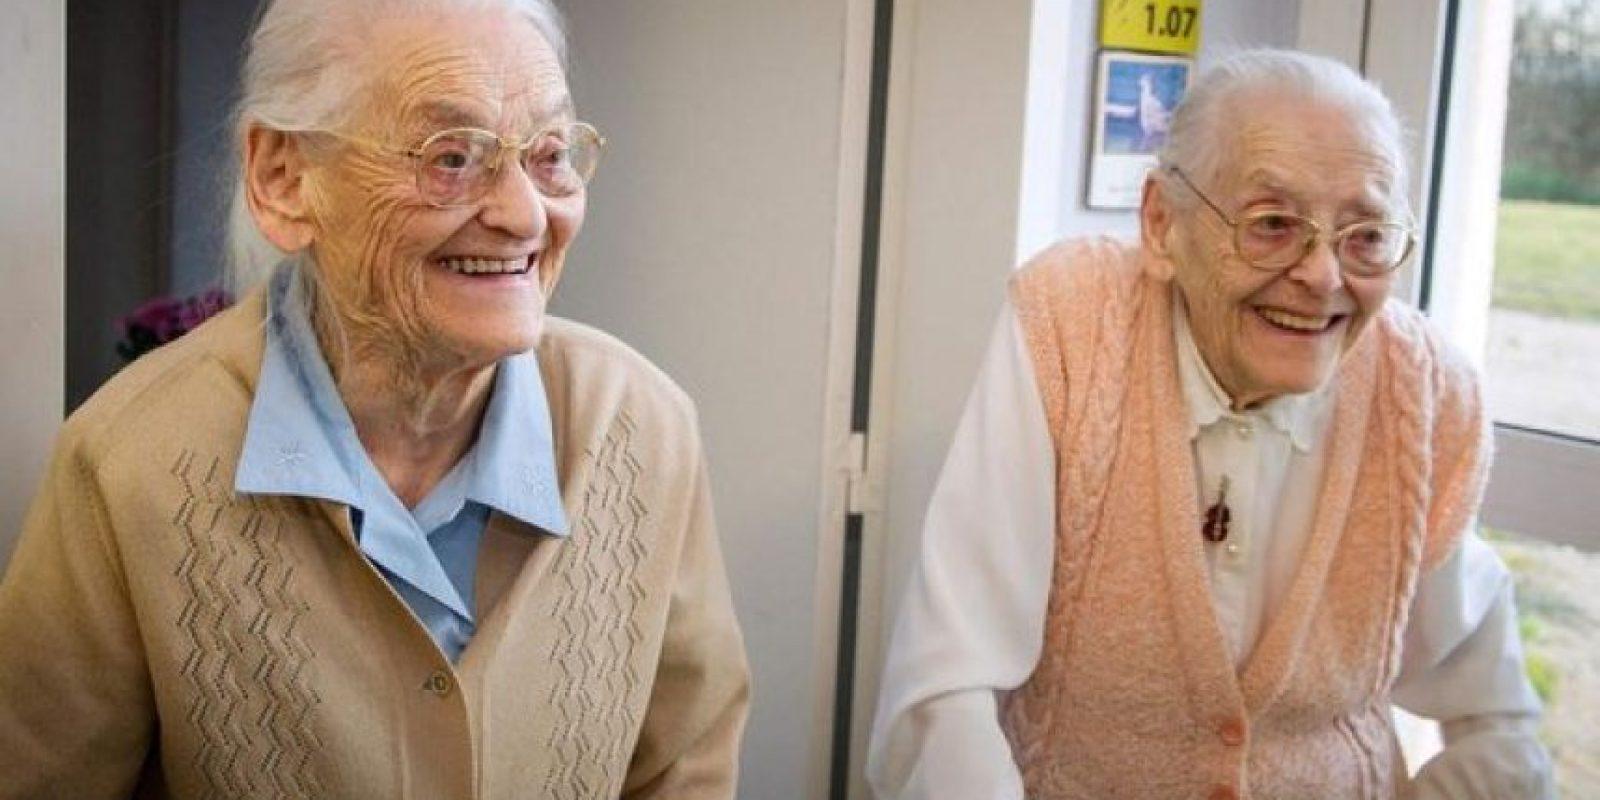 Las hermanas gemelas francesas, Paulette y Simone, cumplieron 208 años. Foto:@cnfocus